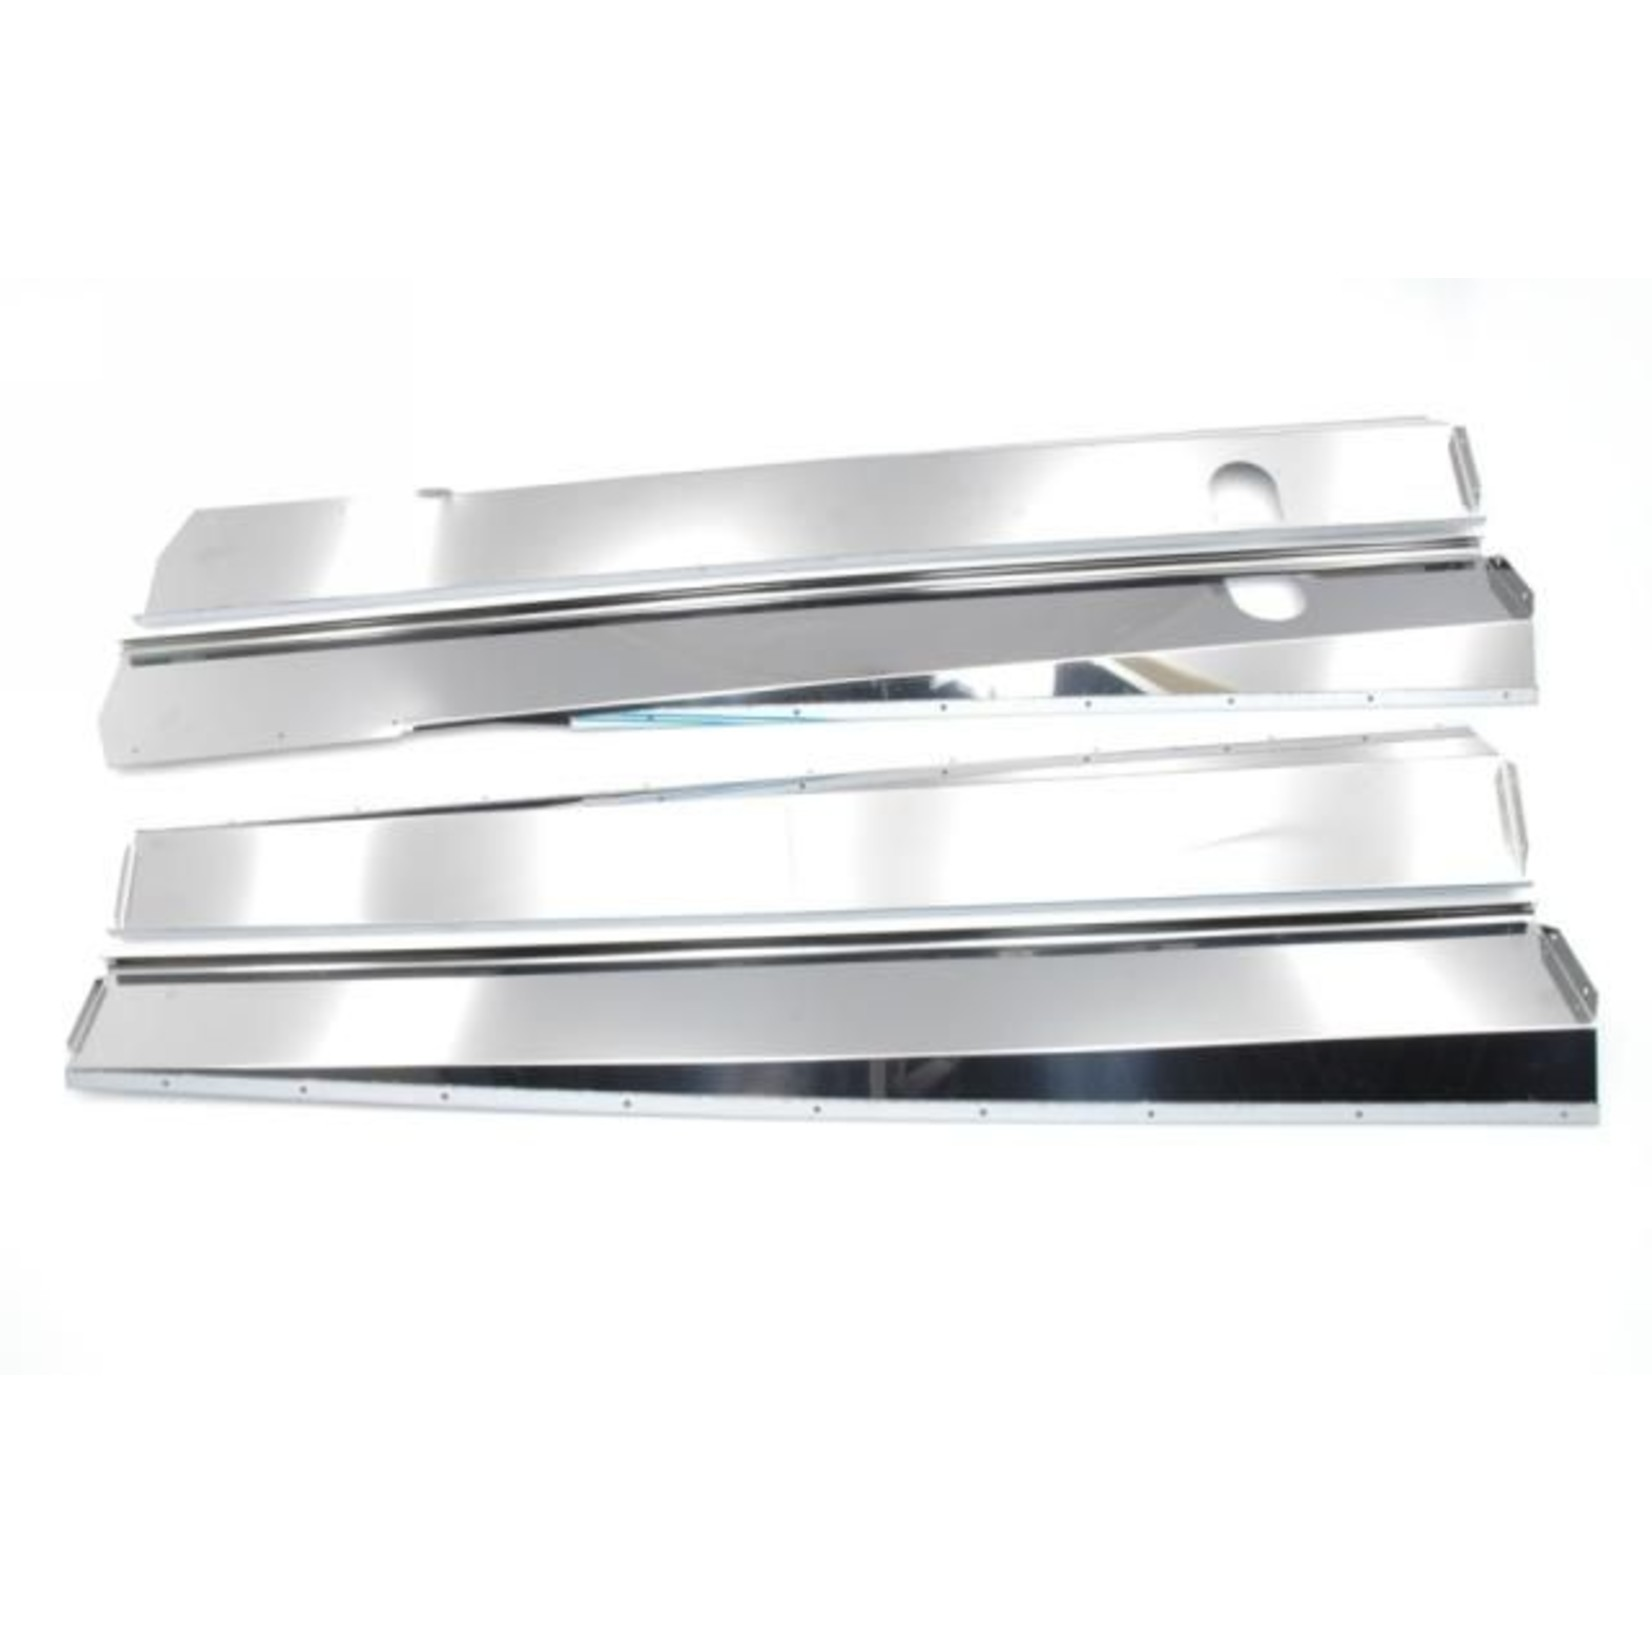 Body panels stainless steel shining Nr Org: DS85362B